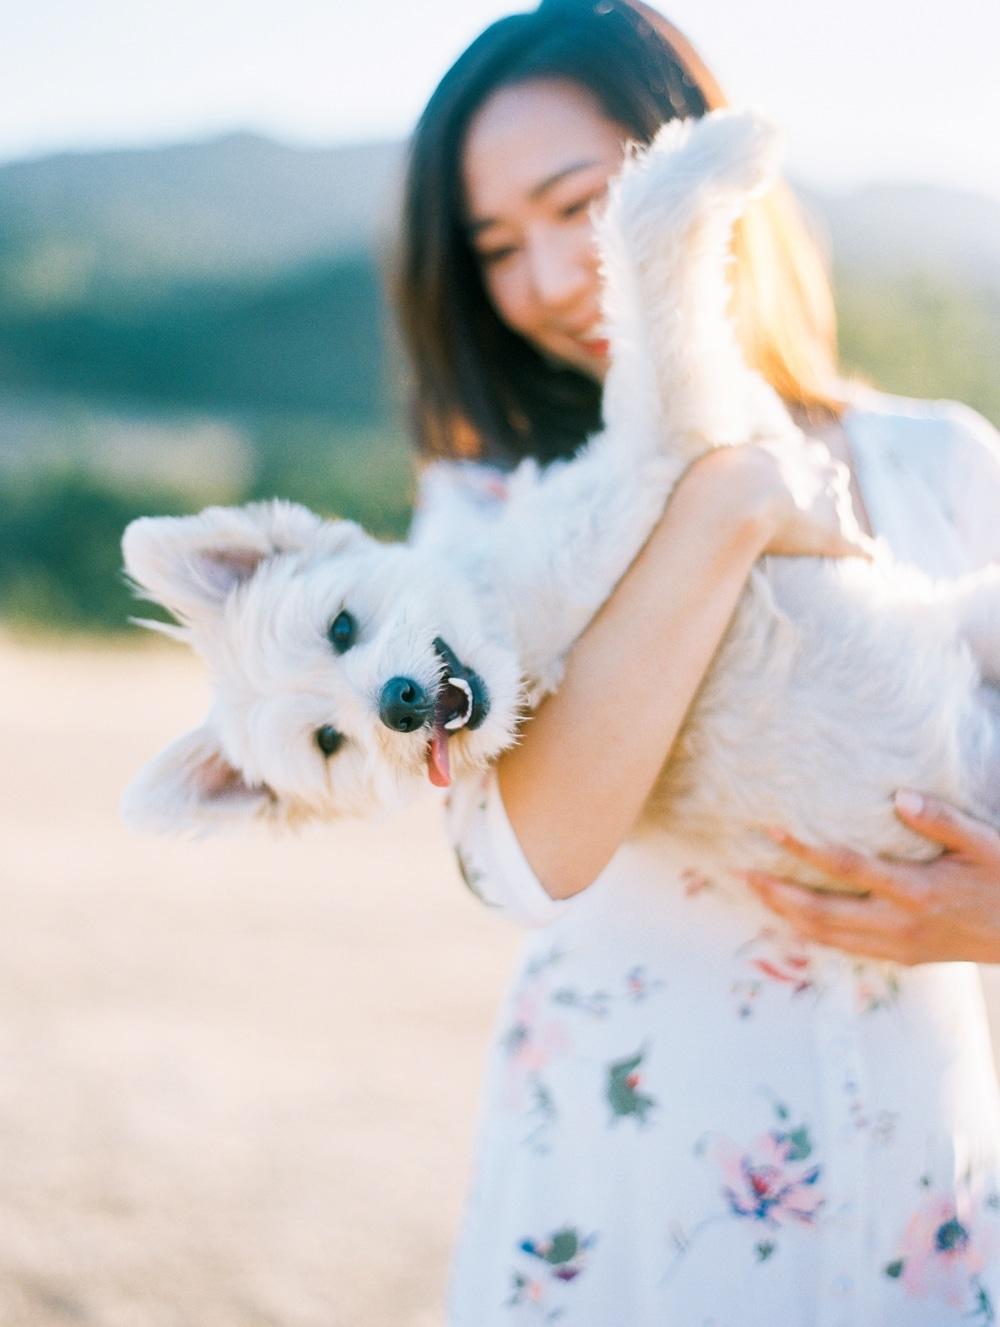 Kristin-La-Voie-Photography-california-wedding-photographer-dog-session-rancho-san-antonio-los-altos-27